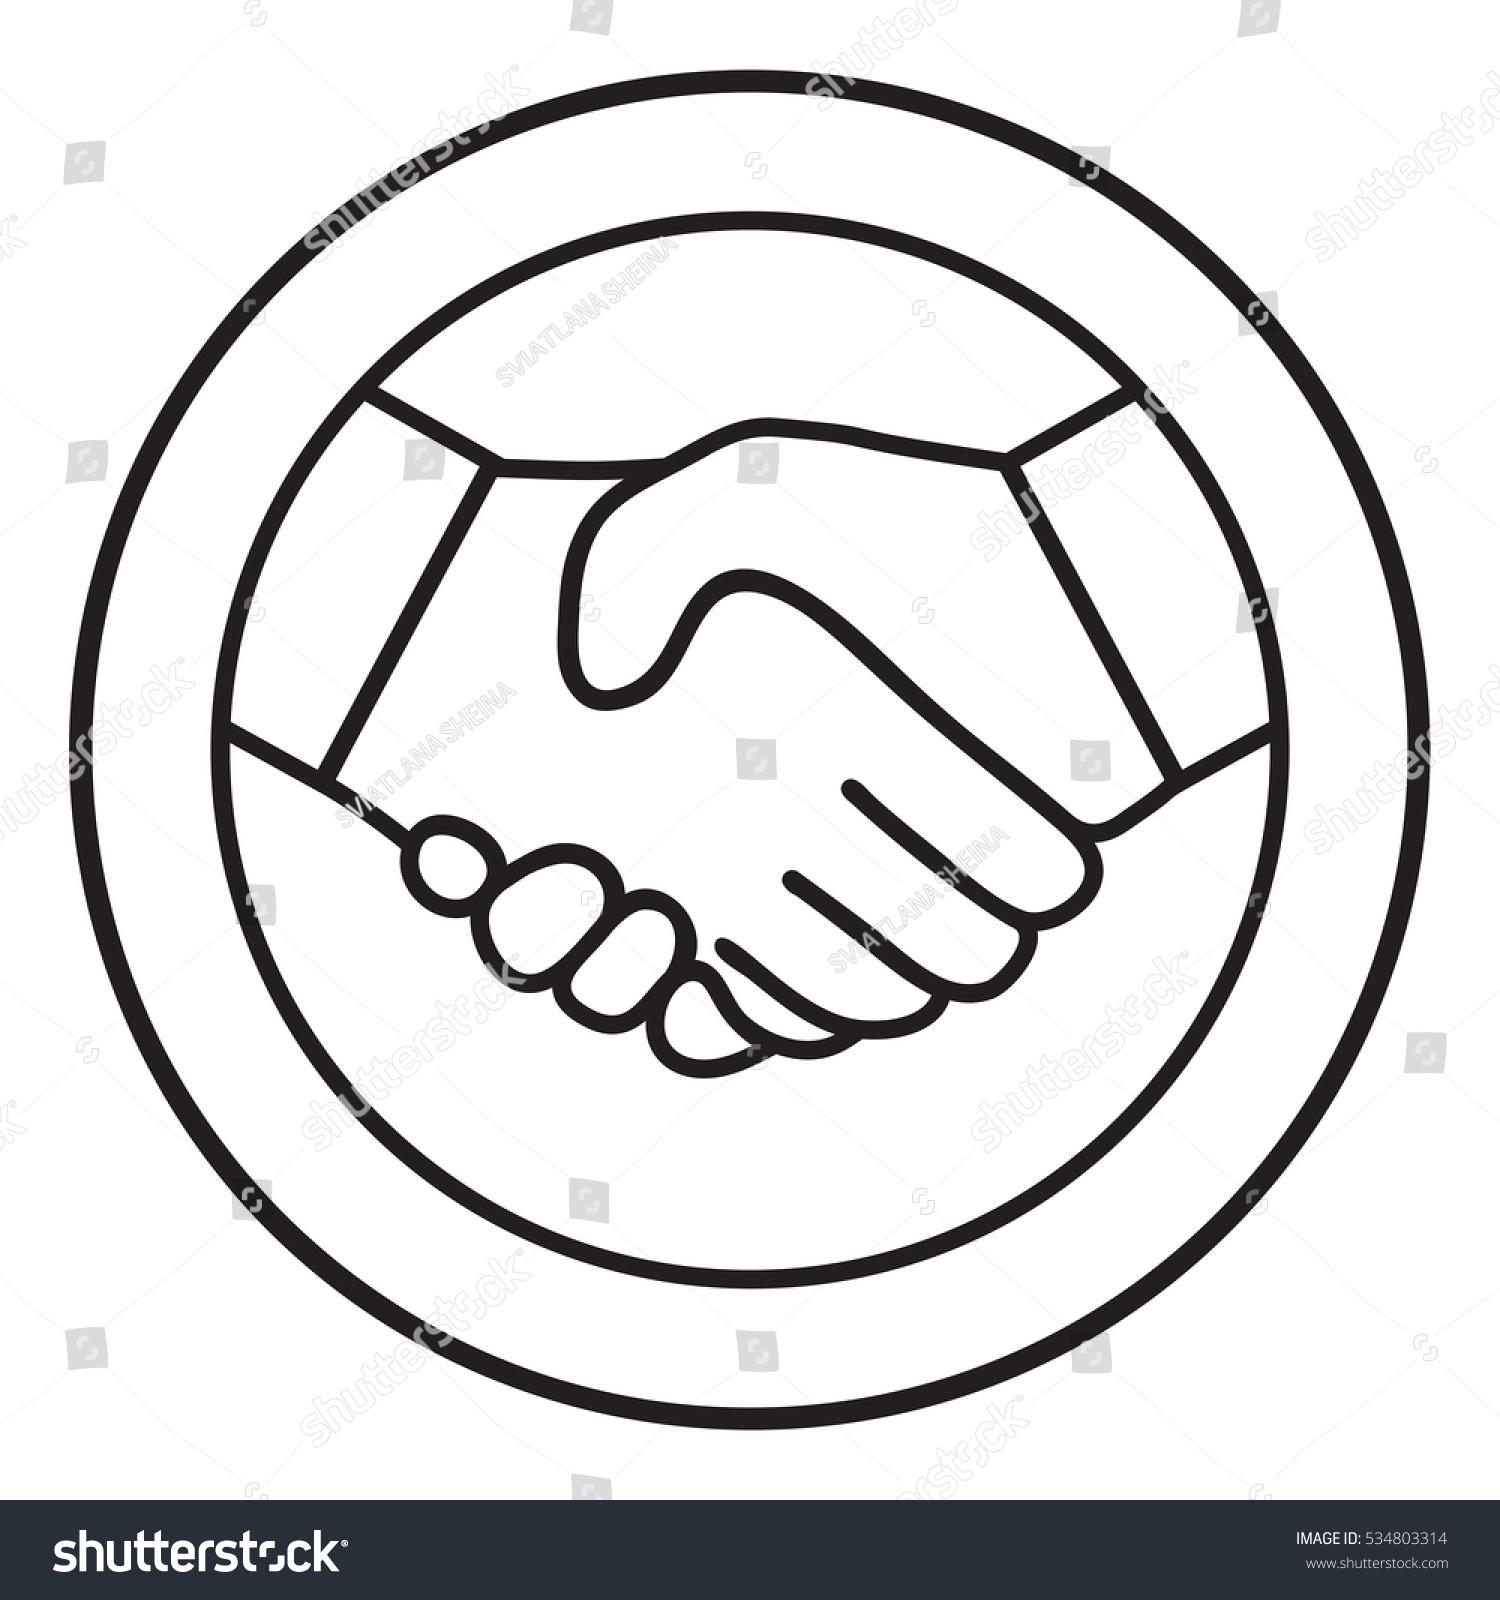 Symbol handshake circle line icon stock vector 534803314 symbol of handshake in circle line icon buycottarizona